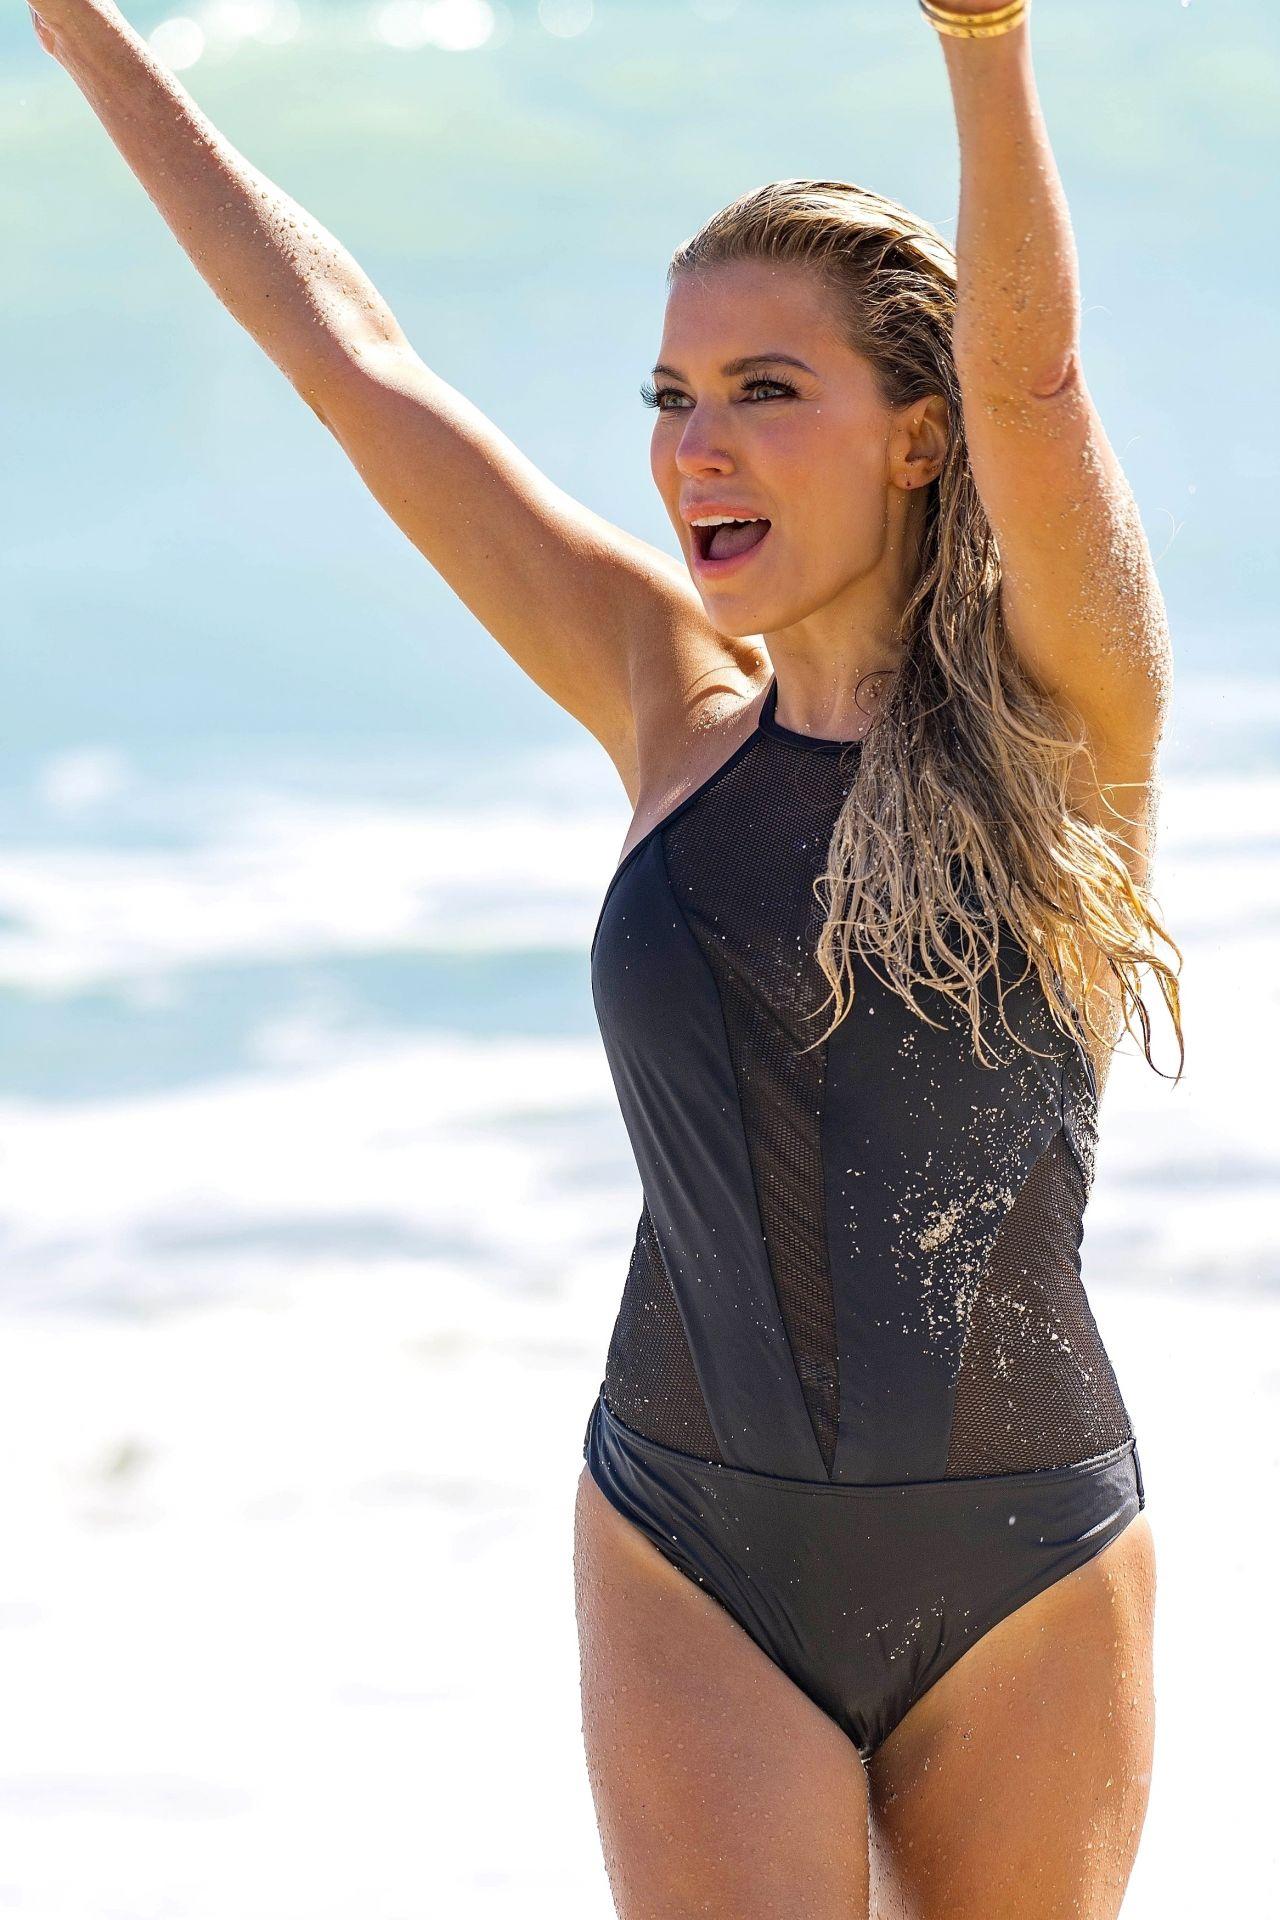 Sylvie Meis in Bikini Shooting her new Sylvie Designs bikini collection in Miami